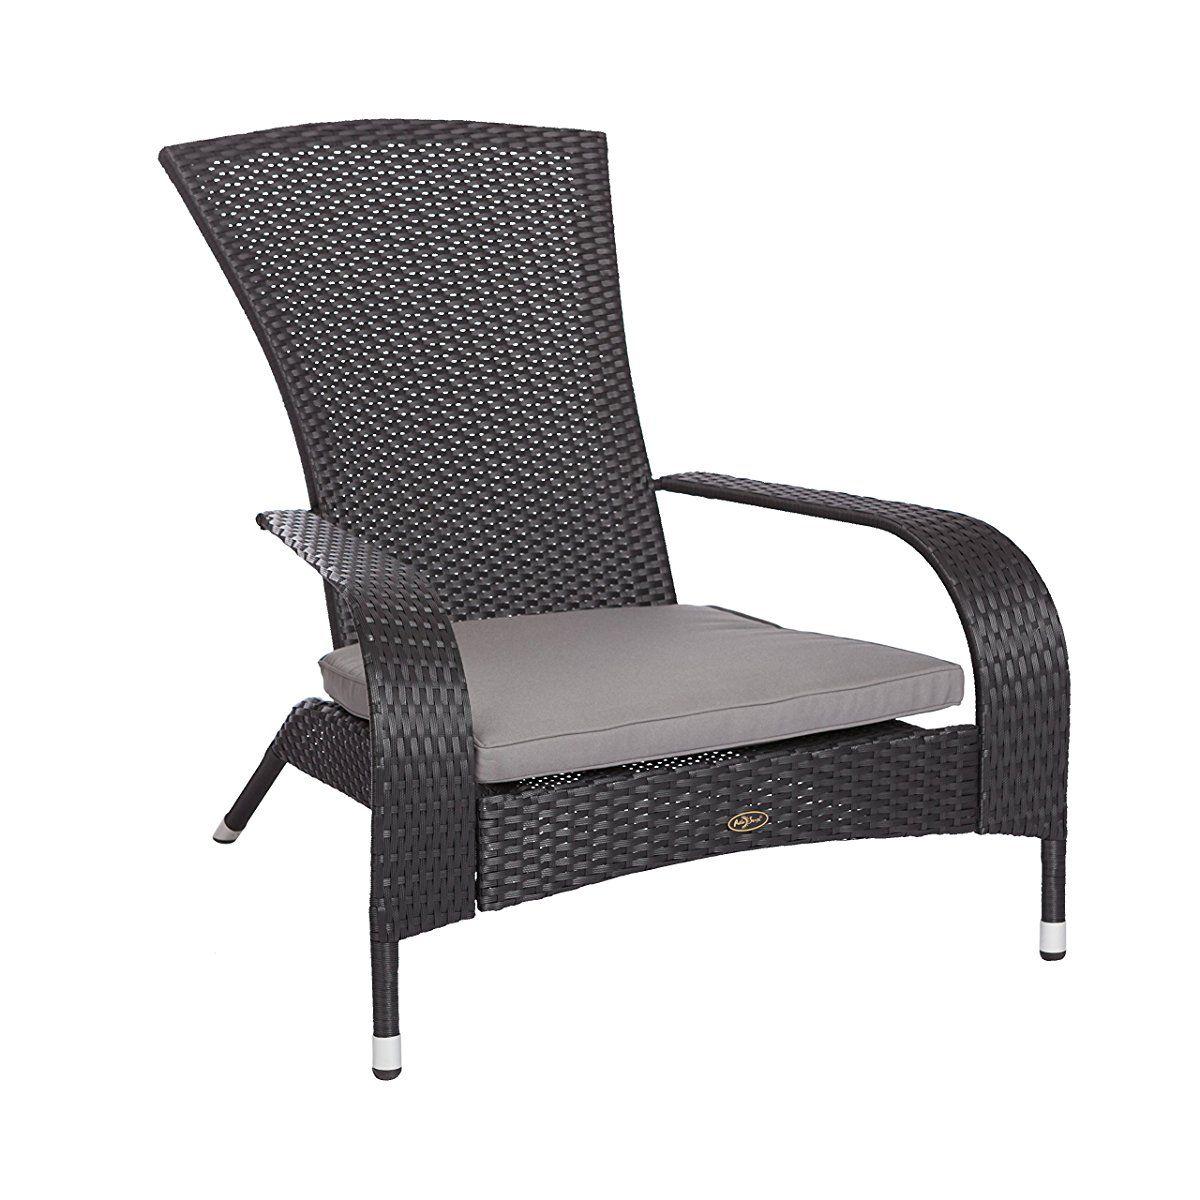 Patio Sense 62430 Coconino Wicker Adirondack Chair Black Lounge Chair Outdoor Outdoor Furniture Wicker Chair